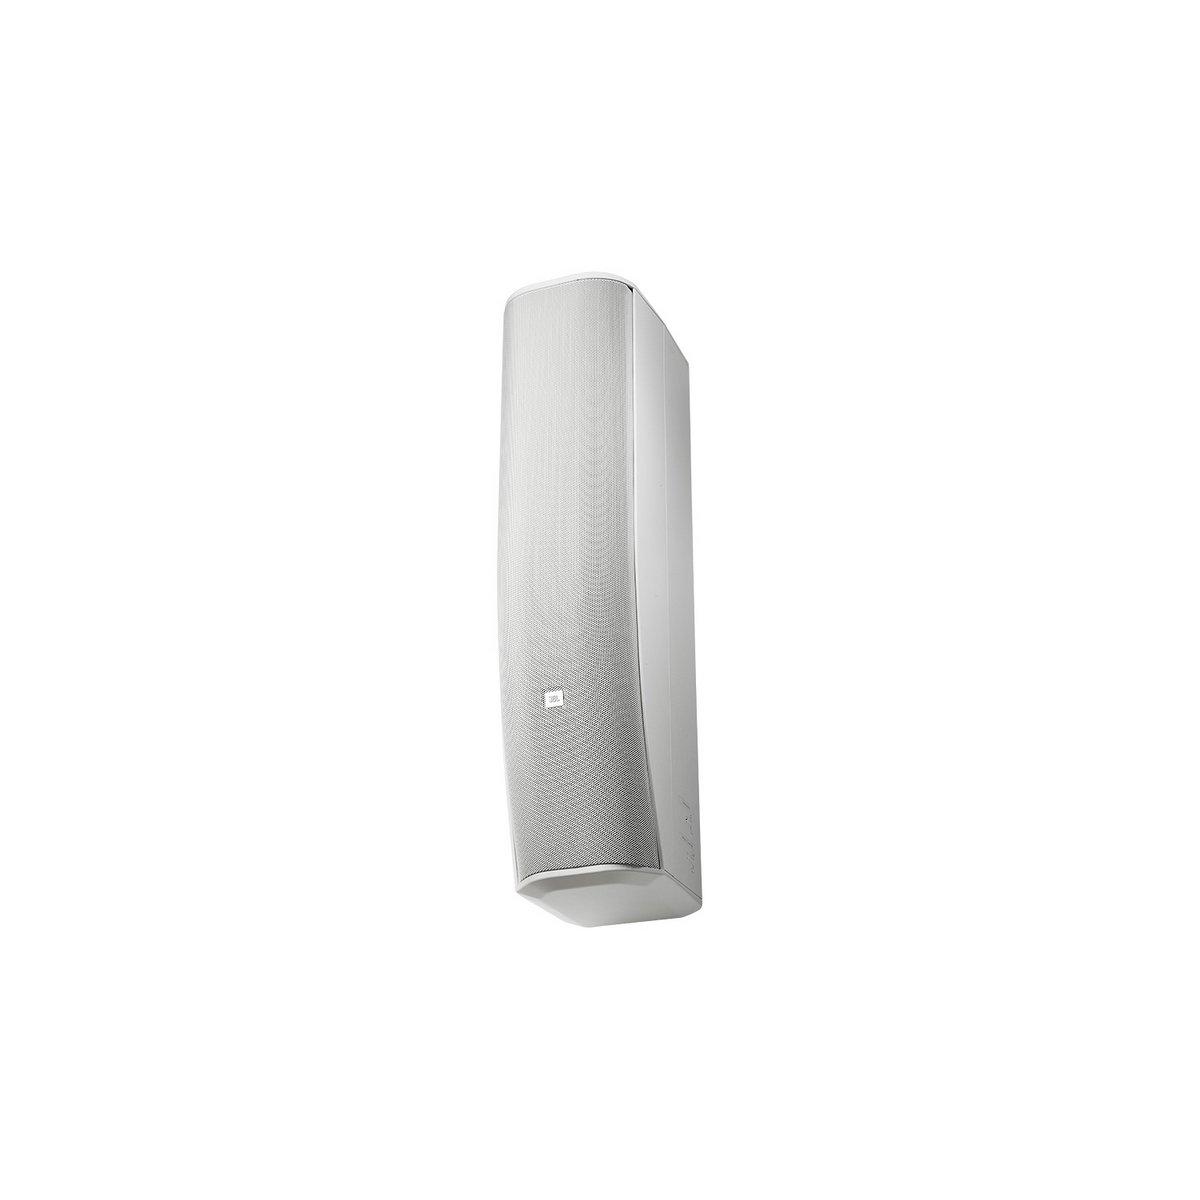 JBL CBT 70J-1-WH | Constant Beamwidth Technology Two Way Line Array Column with Asymmetrical Vertical Cove WHITE by JBL [並行輸入品] B00KI45V52